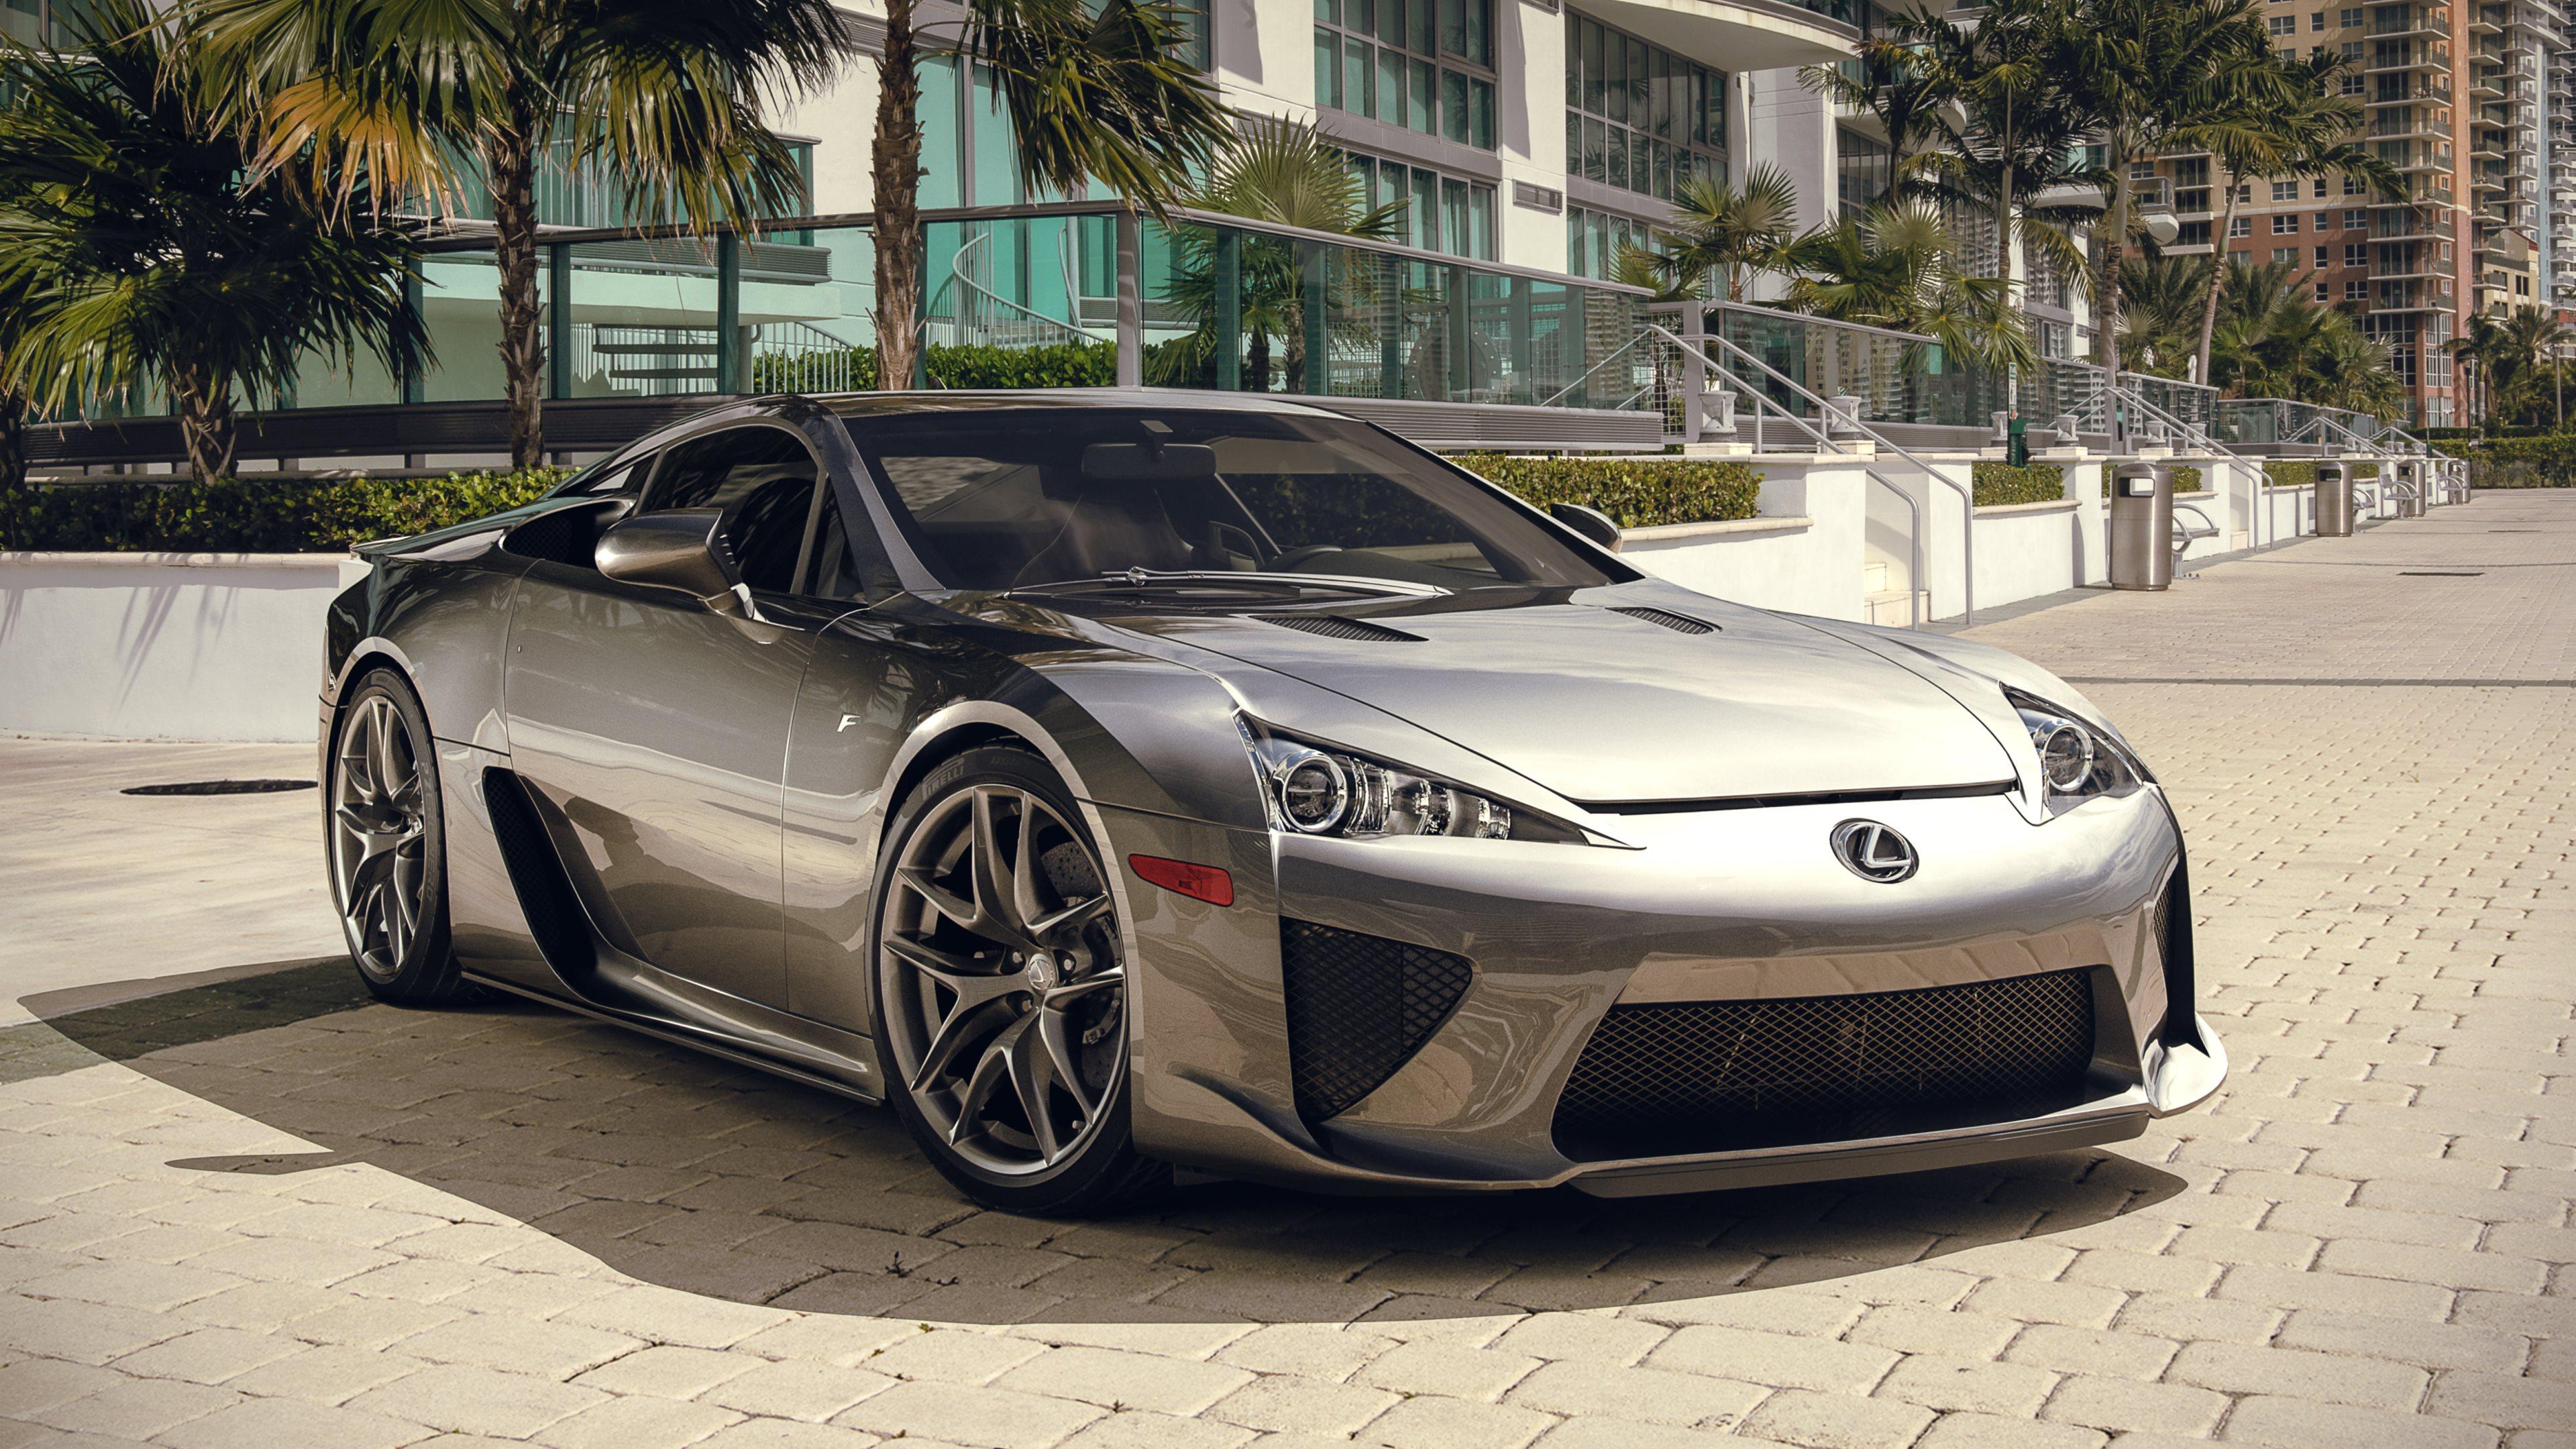 Drag Race 2018 Lexus LFA vs 2020 Nissan GT-R YouTube - 2019 lexus lfa racing wallpapers